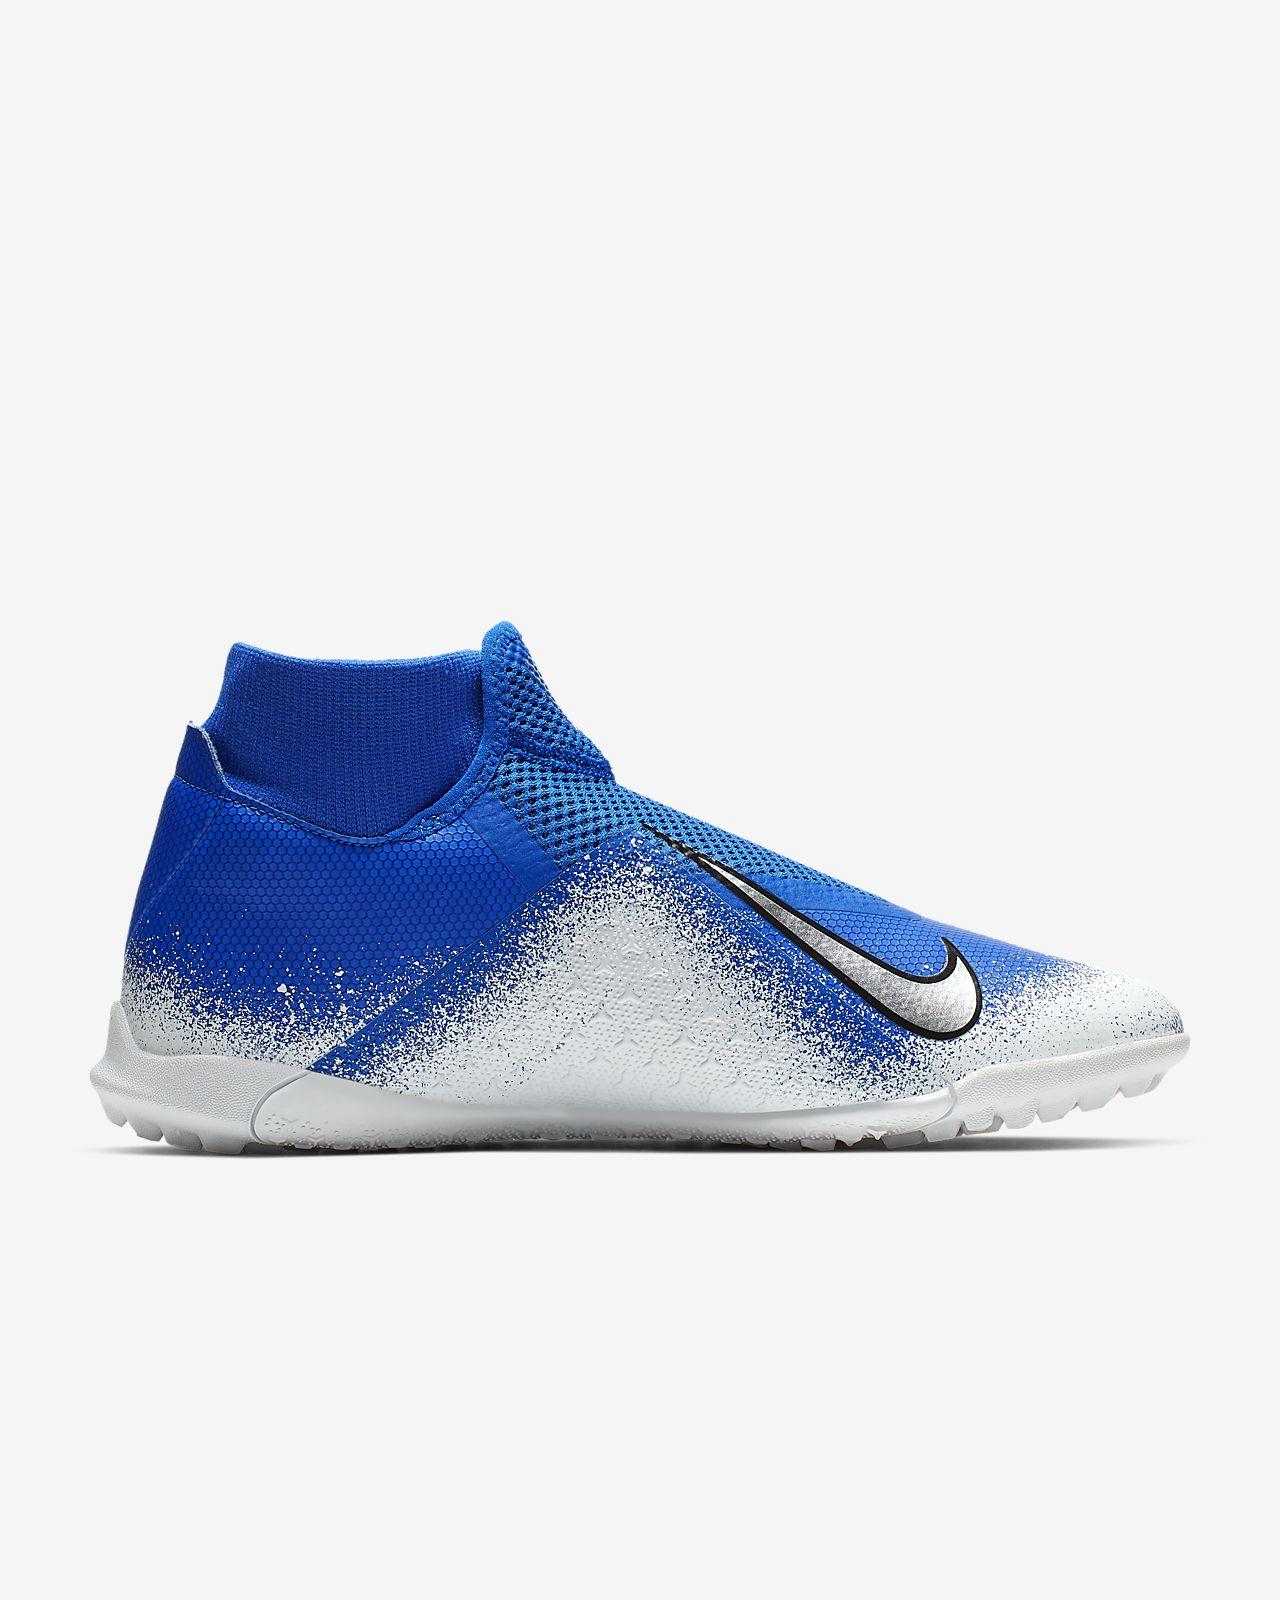 huge discount 4c18e 213af Nike Phantom Vision Academy Dynamic Fit Turf Football Shoe. Nike.com GB